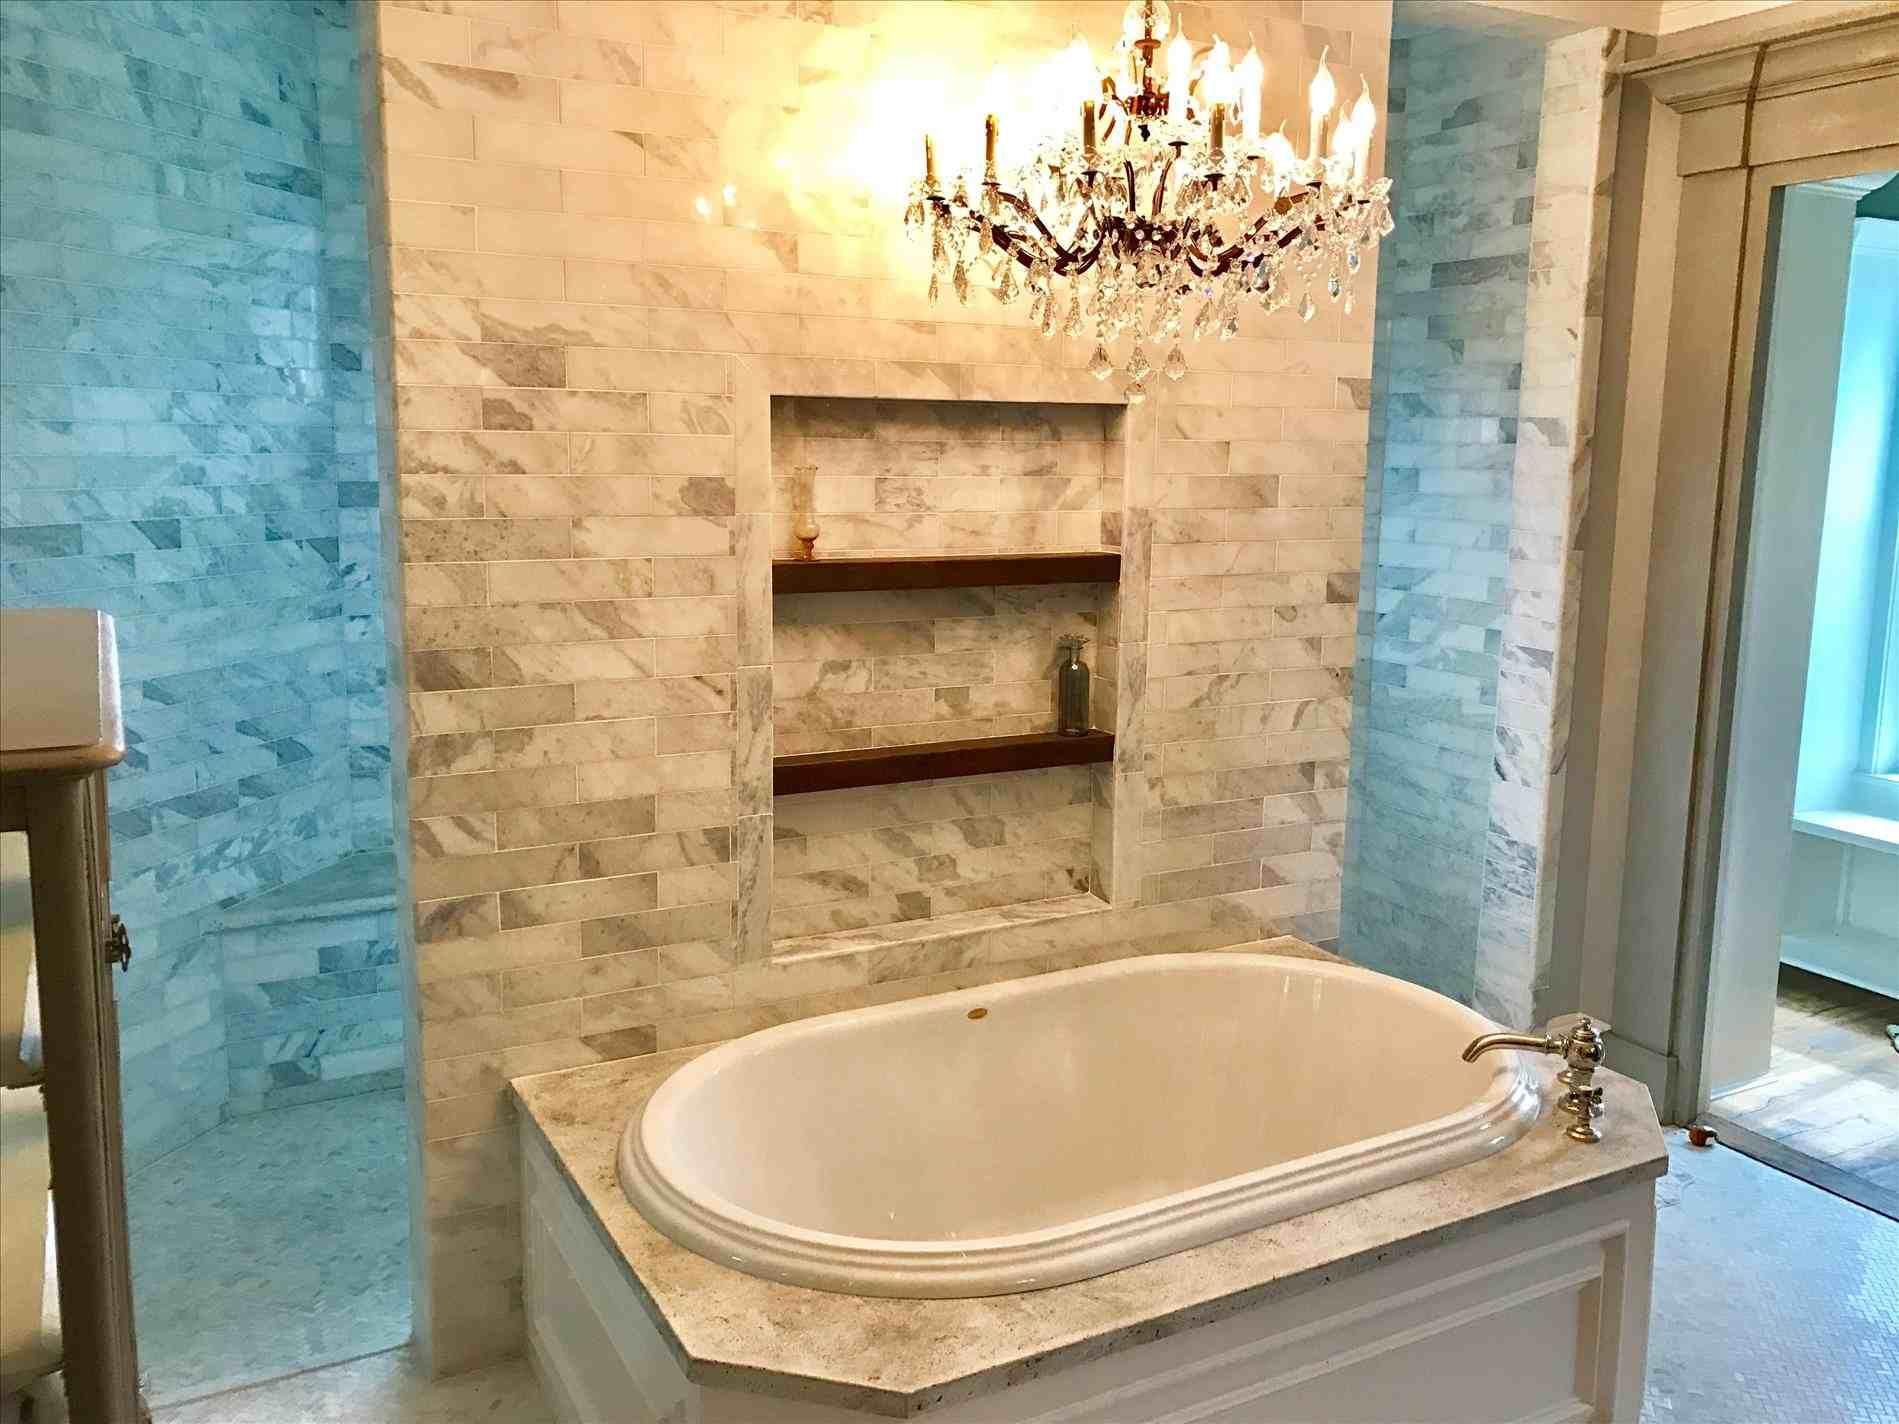 This custom concrete bathtubs home ue gallery ue concrete sinks and